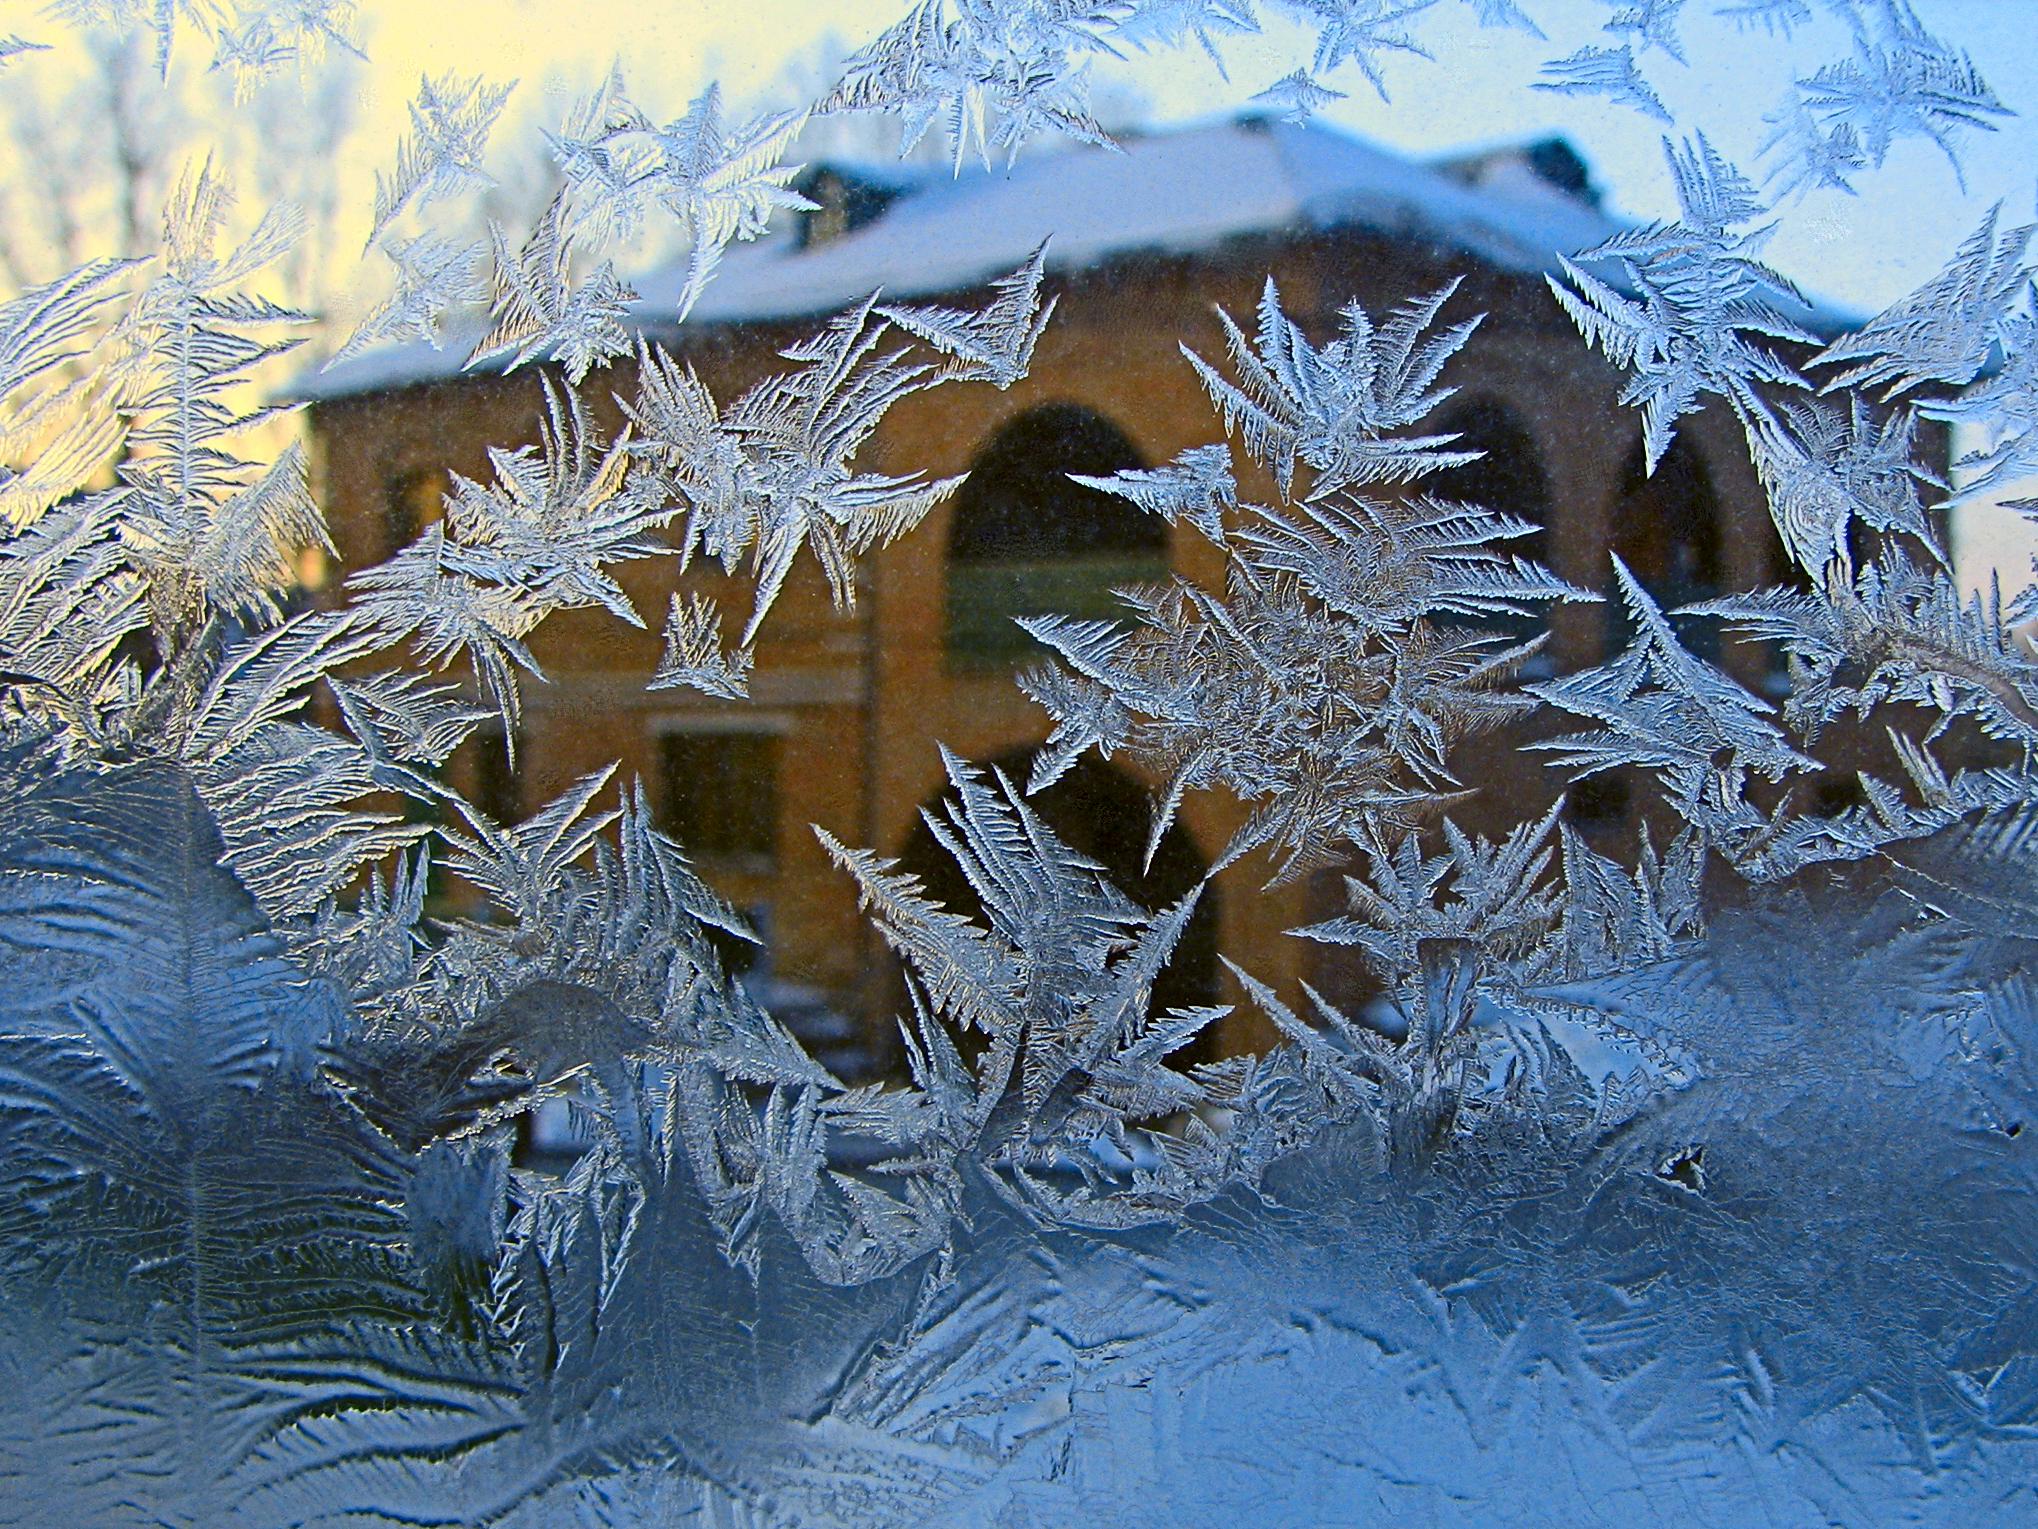 считают, мороз на окне картинки в домах связи сложившимися